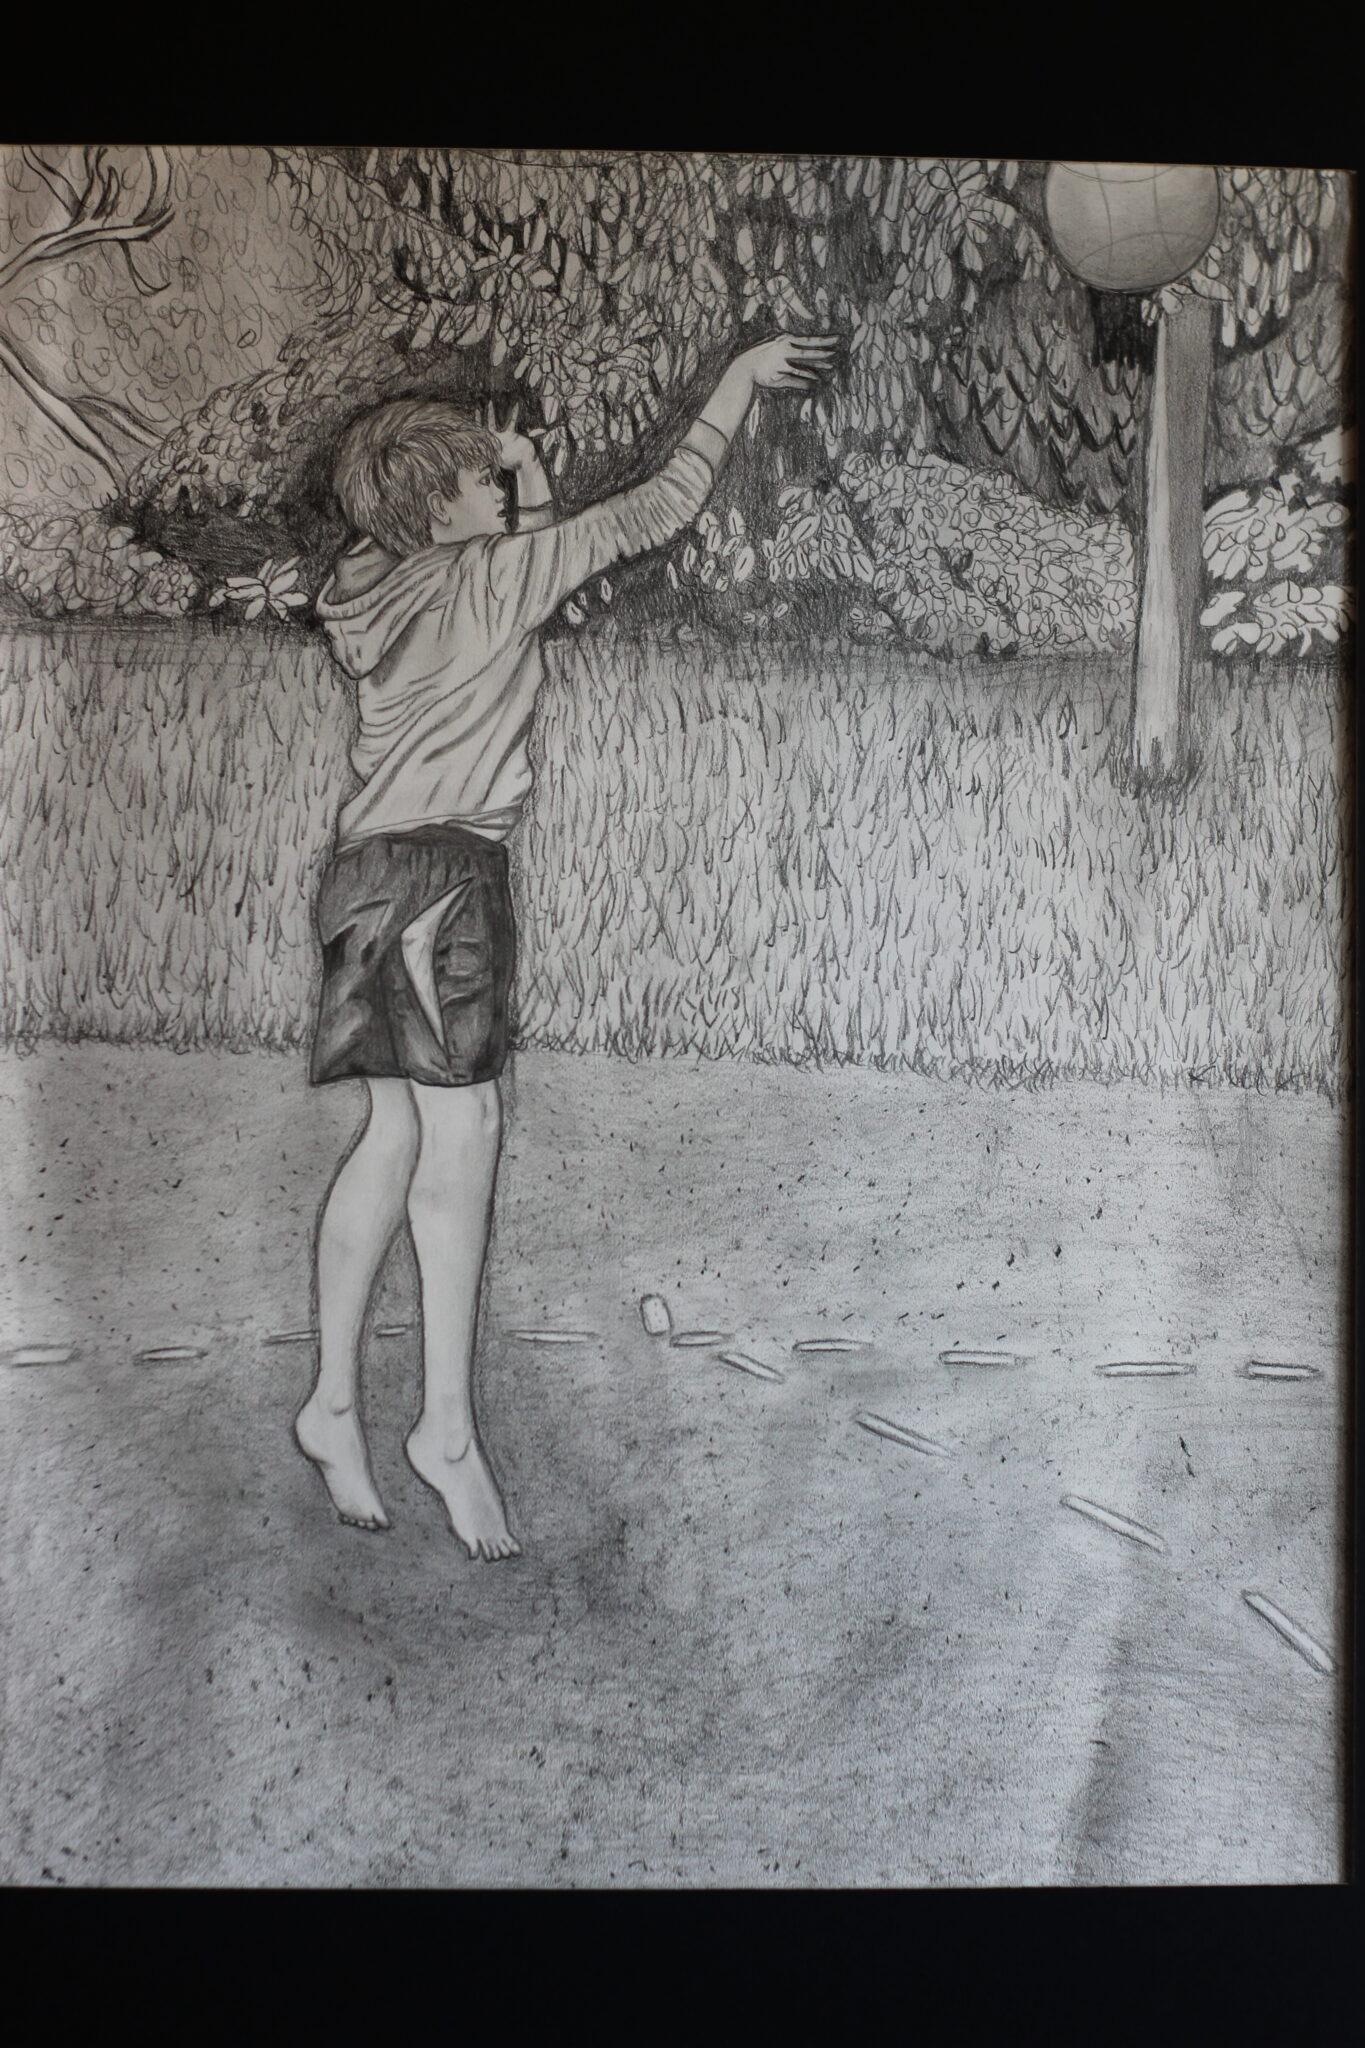 sketch of boy playing basketball